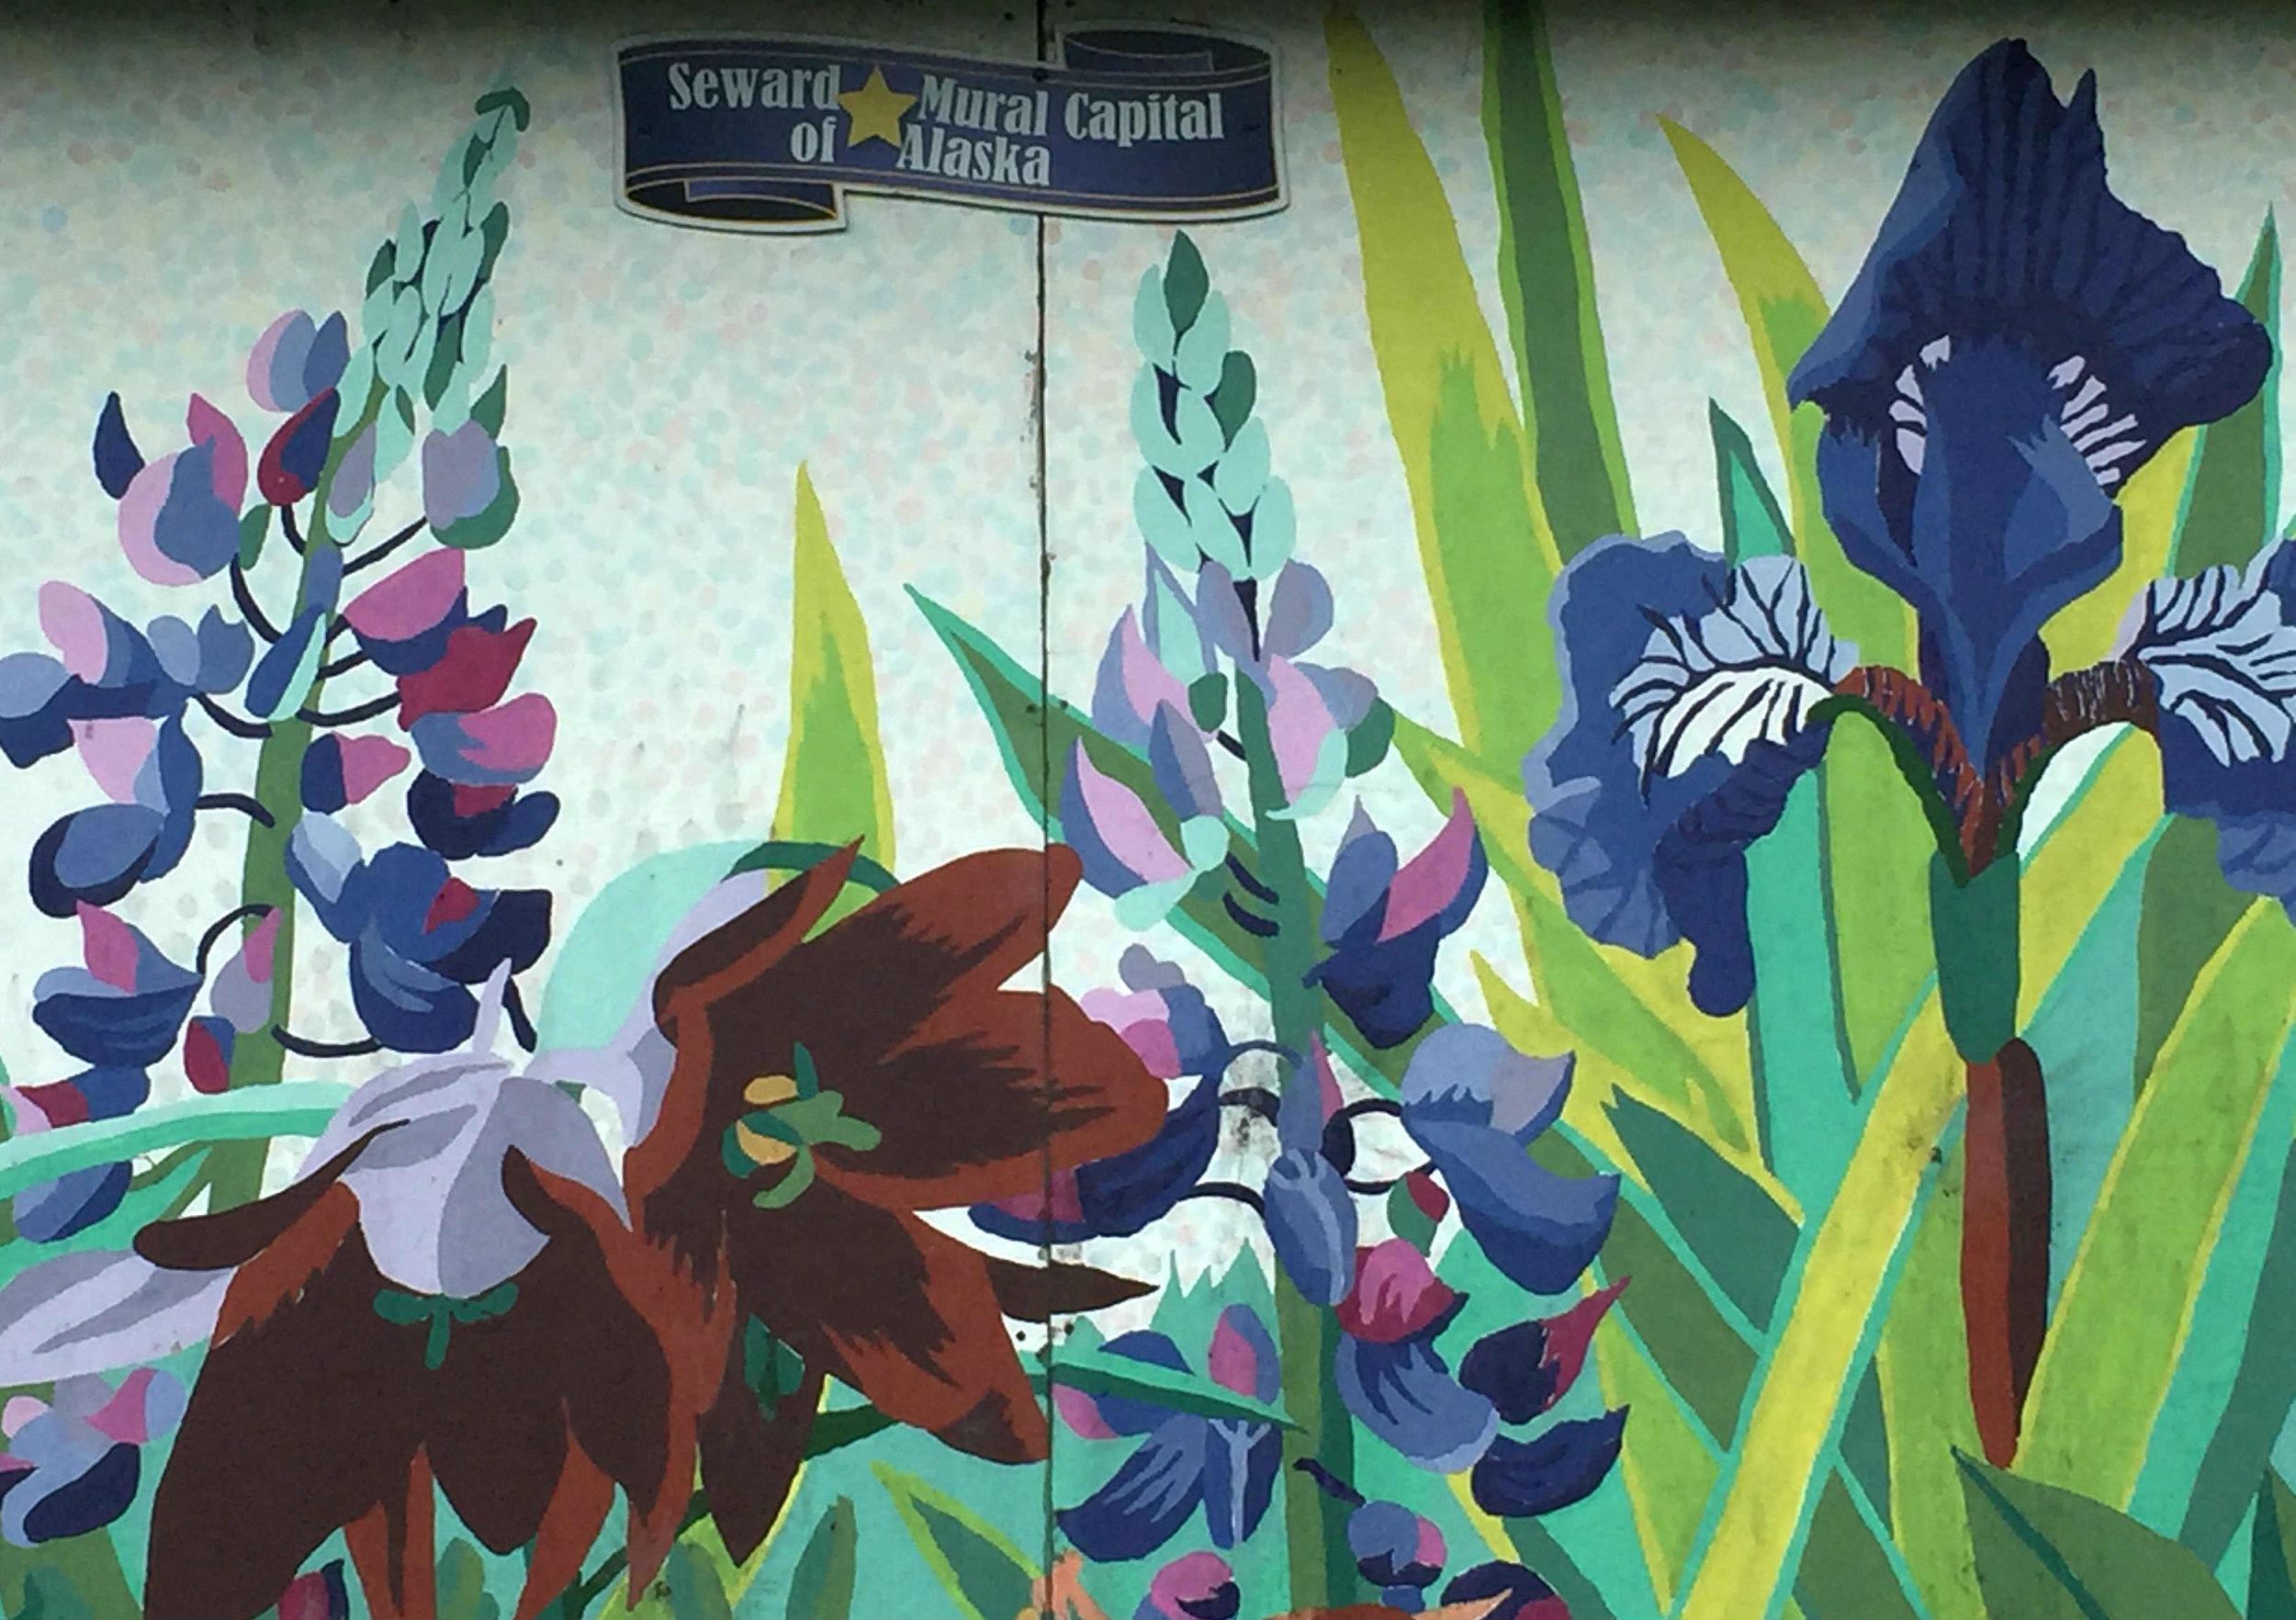 mural capital of Alaska